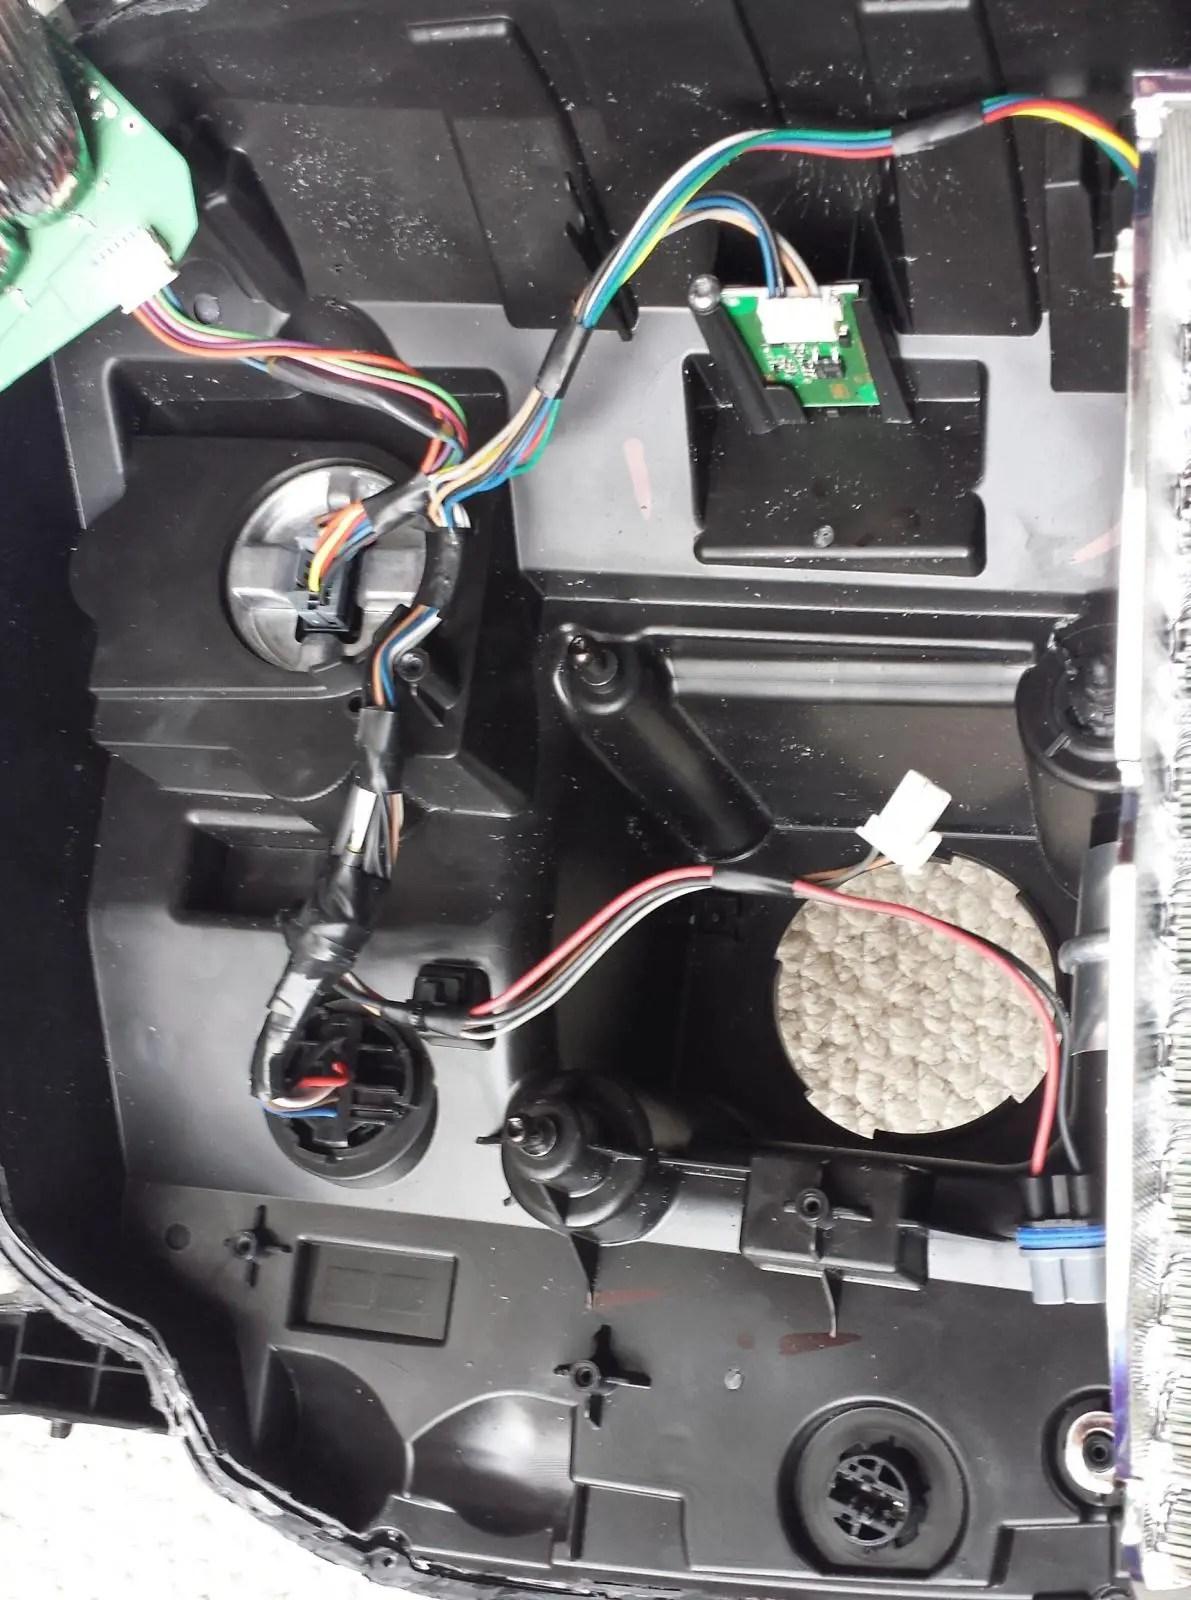 hight resolution of gmc sierra headlight wiring harness wiring diagram table 2000 gmc sierra headlight wiring diagram gmc sierra headlight wiring